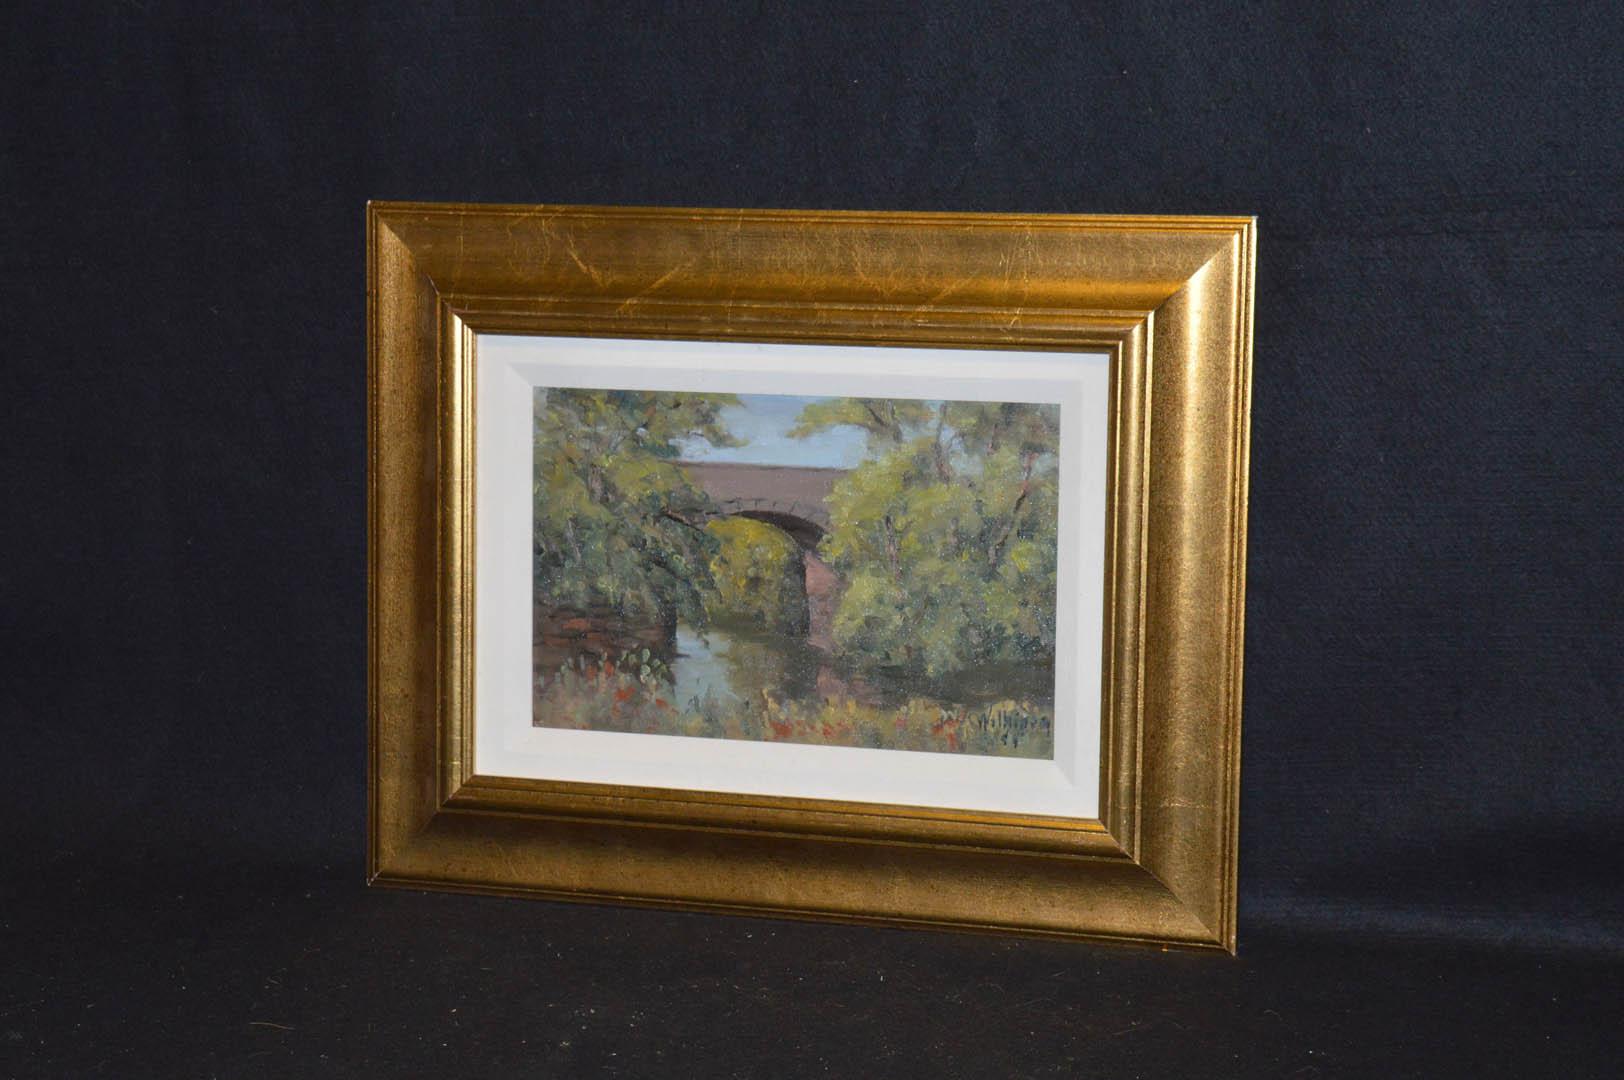 Lot 69 - An Oil Painting 'The Railway Bridge, Ballymoney' - Jack Wilkinson